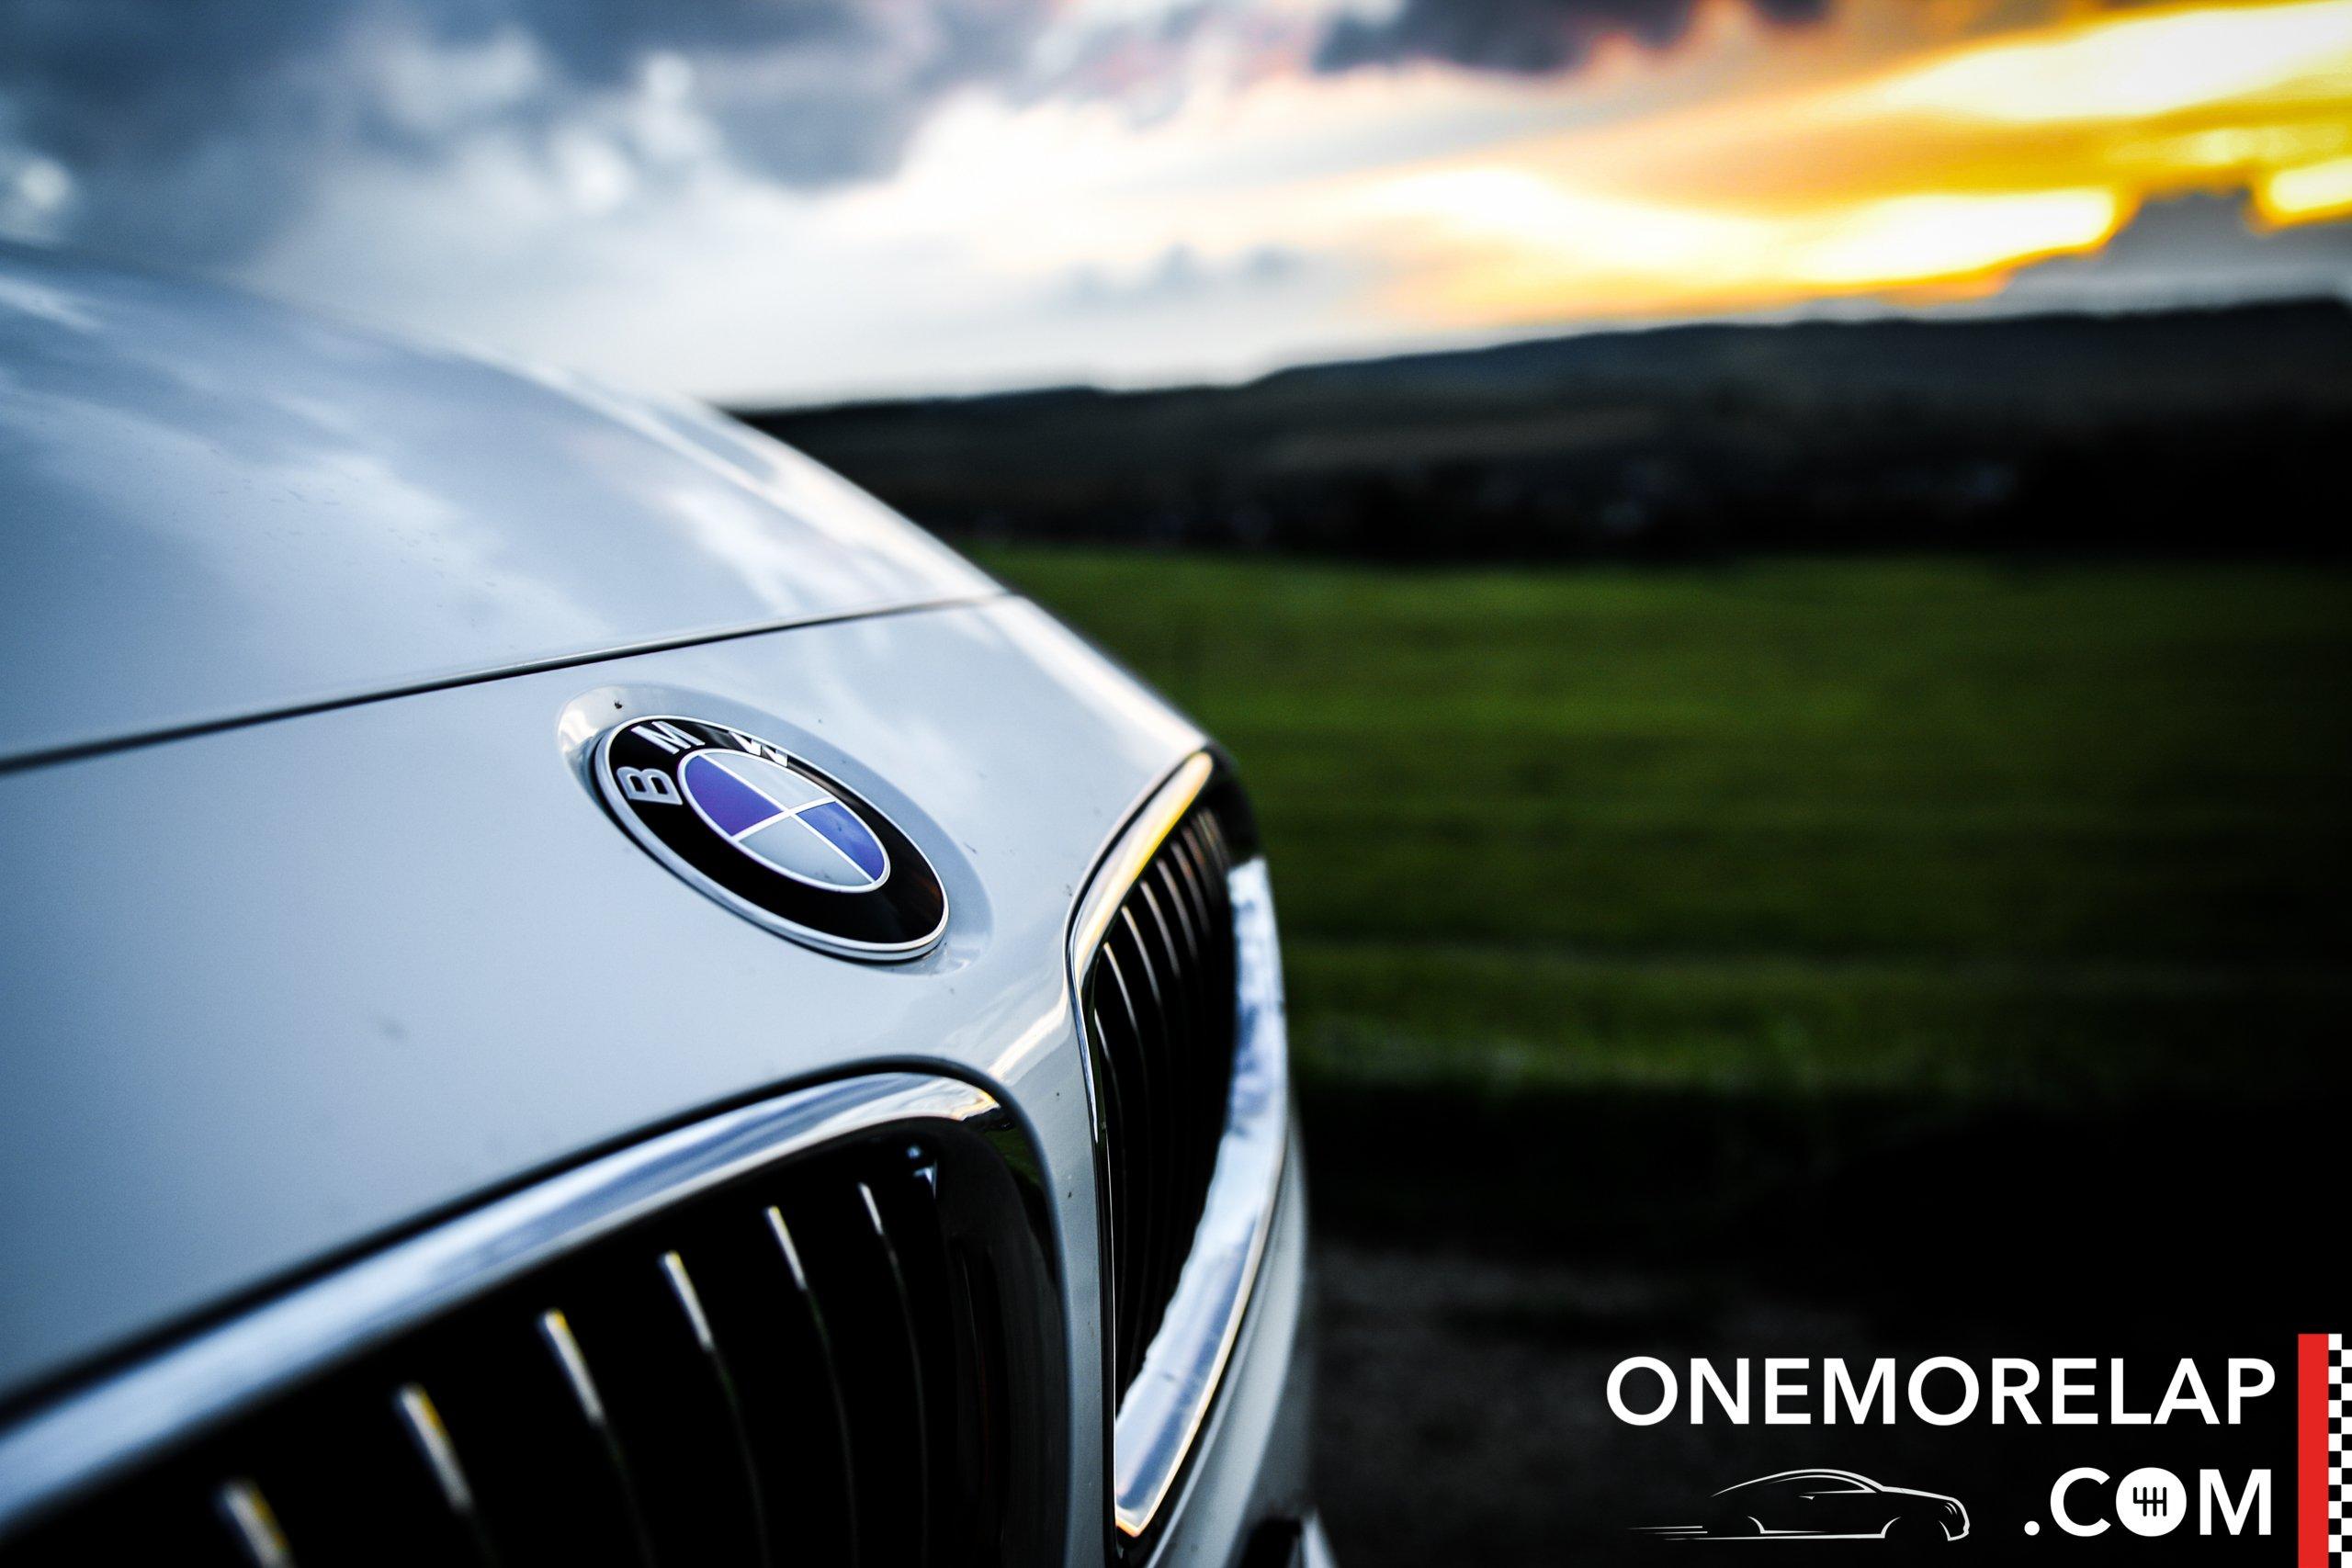 Fahrbericht: BMW 335d xDrive Touring F31 LCI Luxury